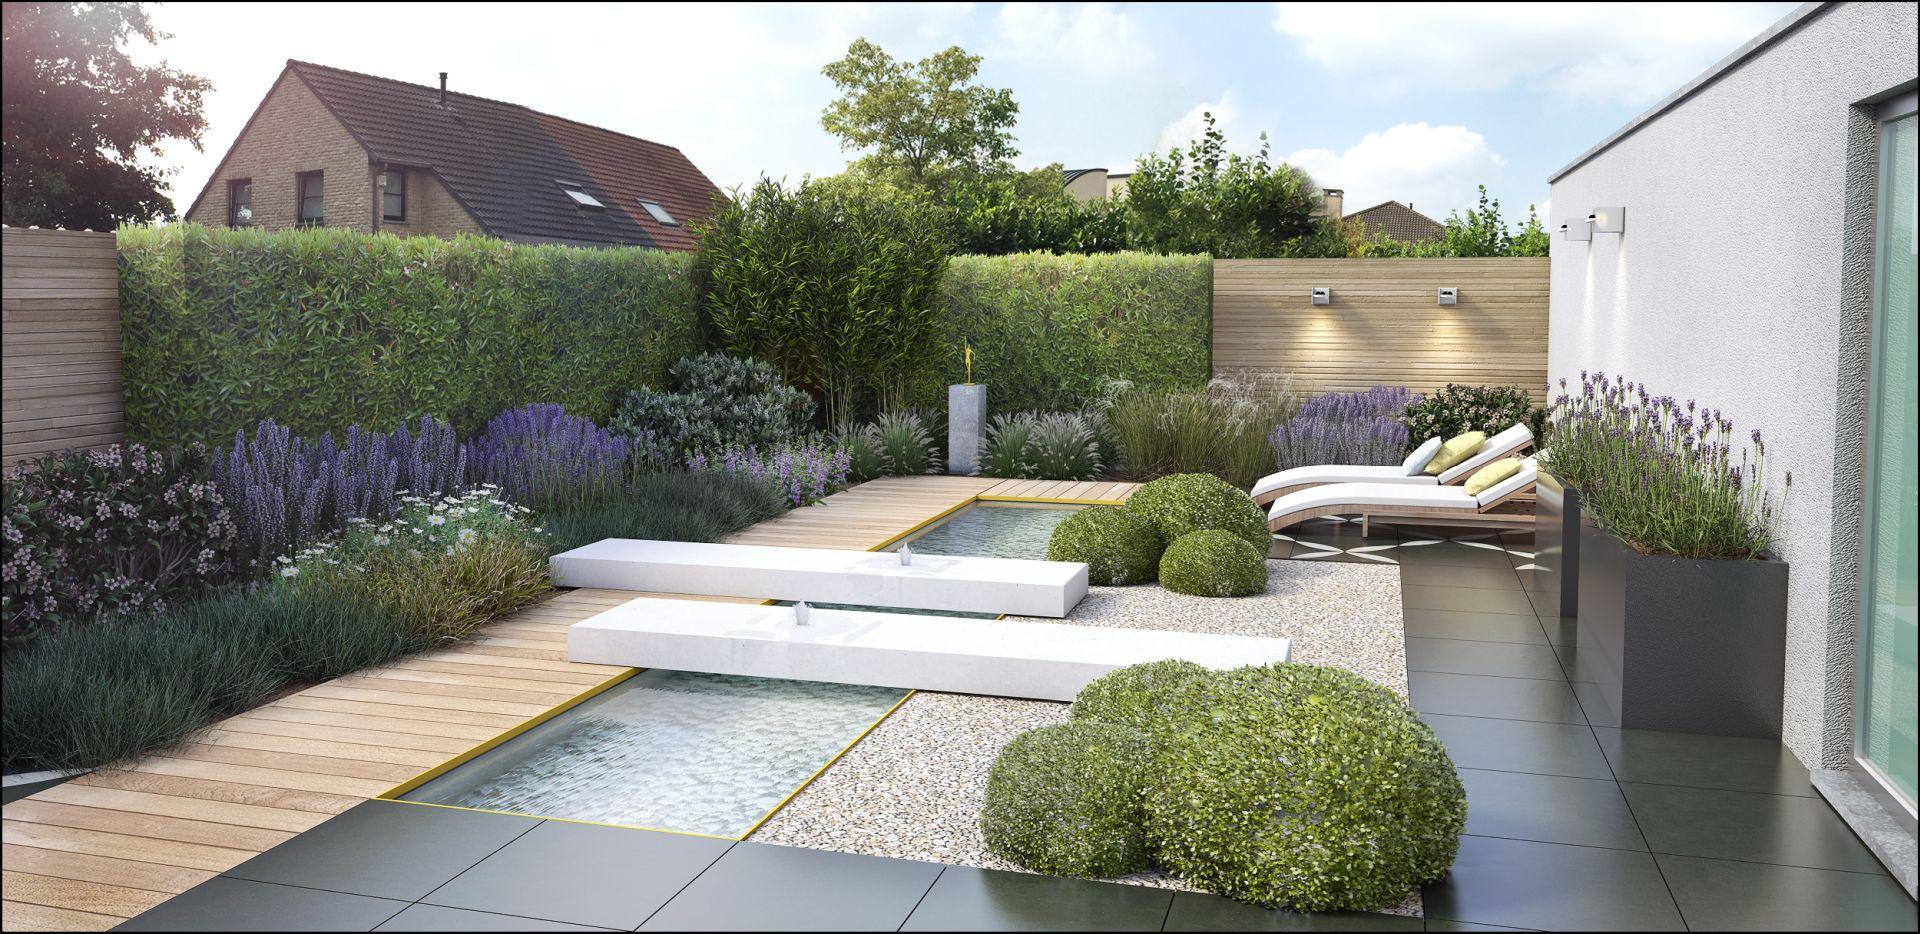 Eco tuinarchitectengroep 3d projecten strakke for Strakke kleine tuin